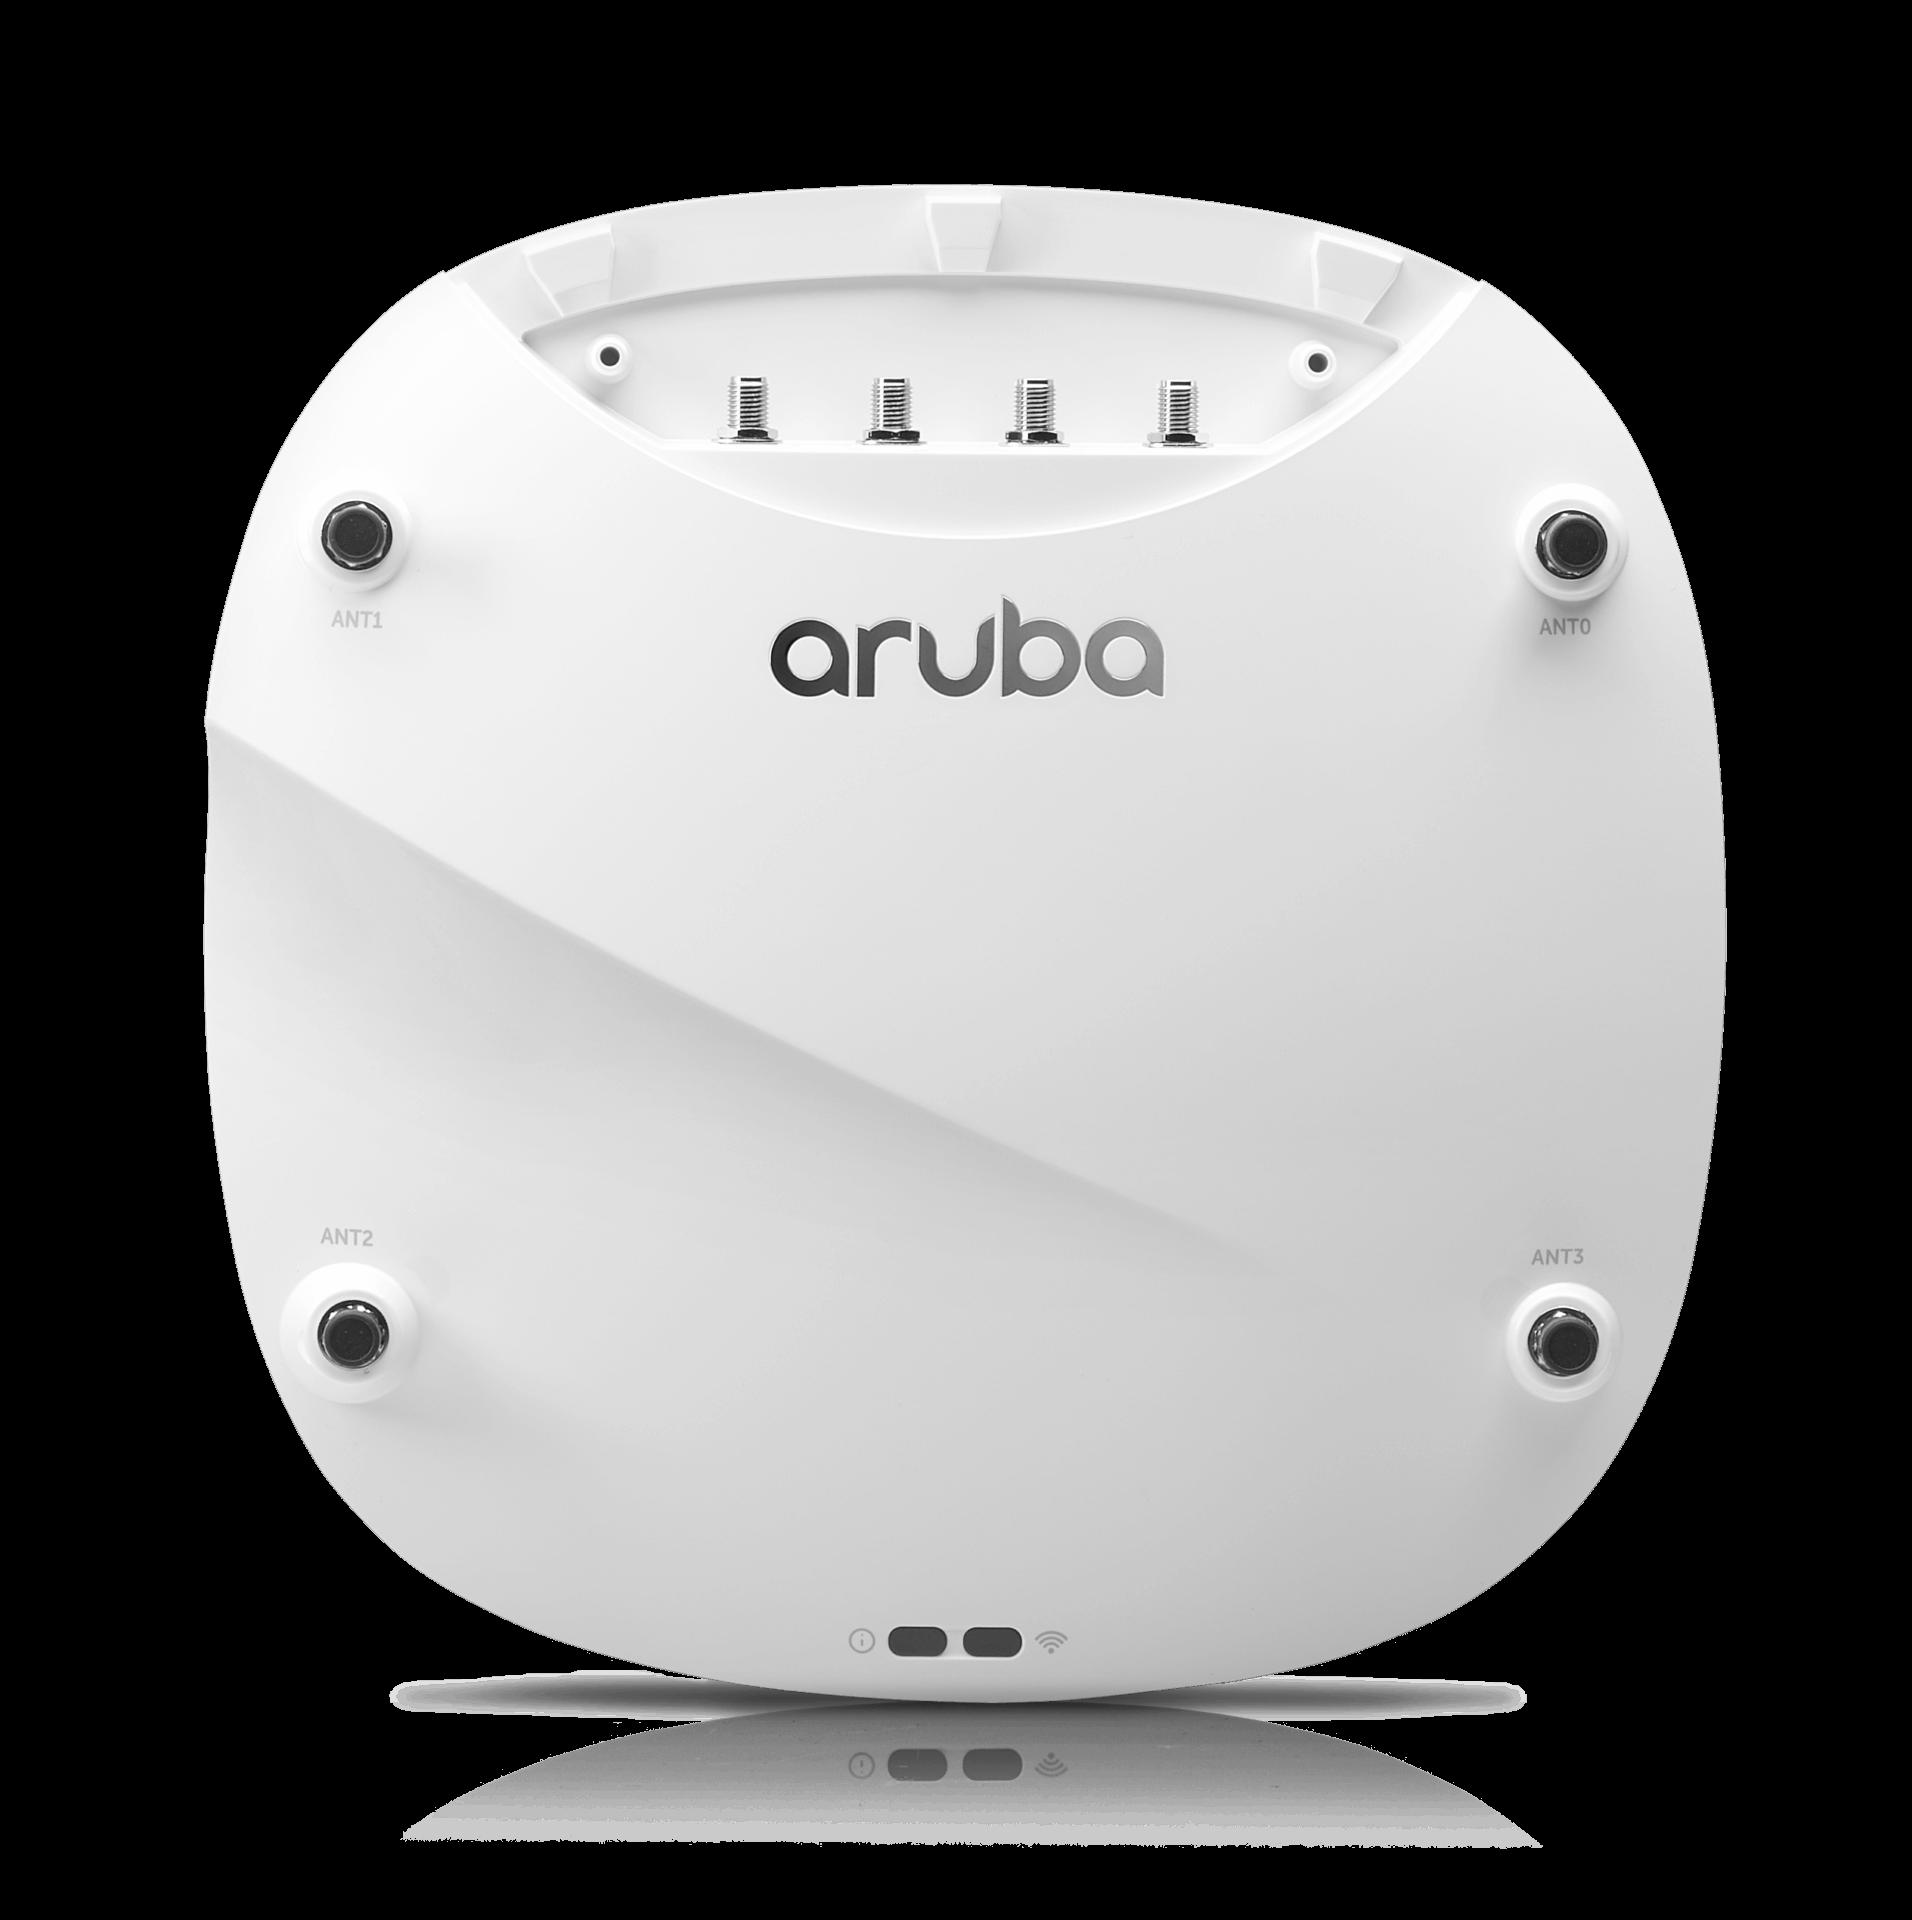 How Aruba Optimizes Performance of Dual 5-GHz APs